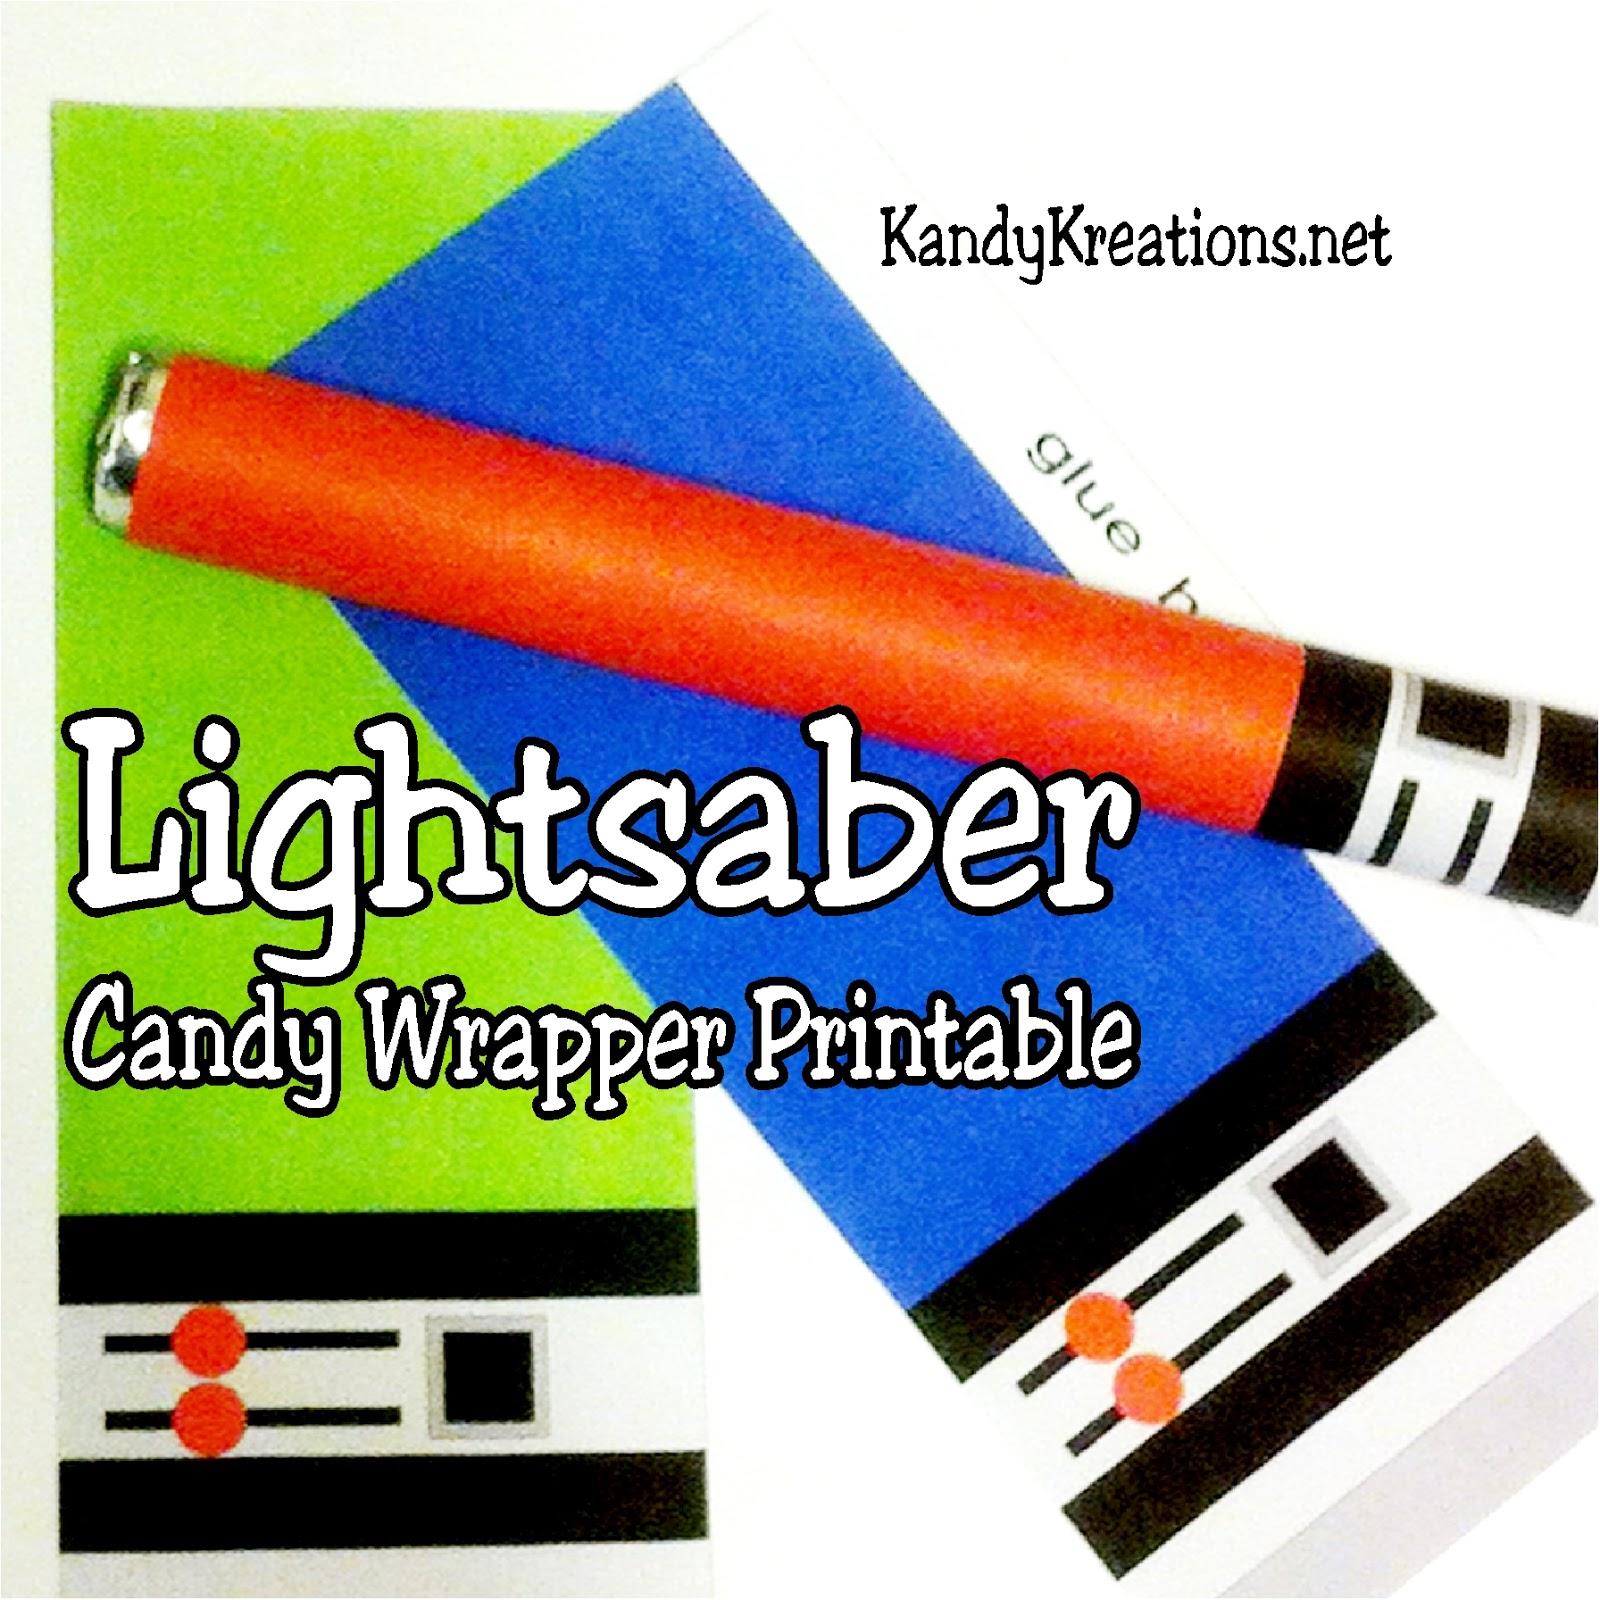 photo regarding Lightsaber Printable named Do-it-yourself Social gathering Mother: Lightsaber Adorable Tart Sweet Wrapper Printables